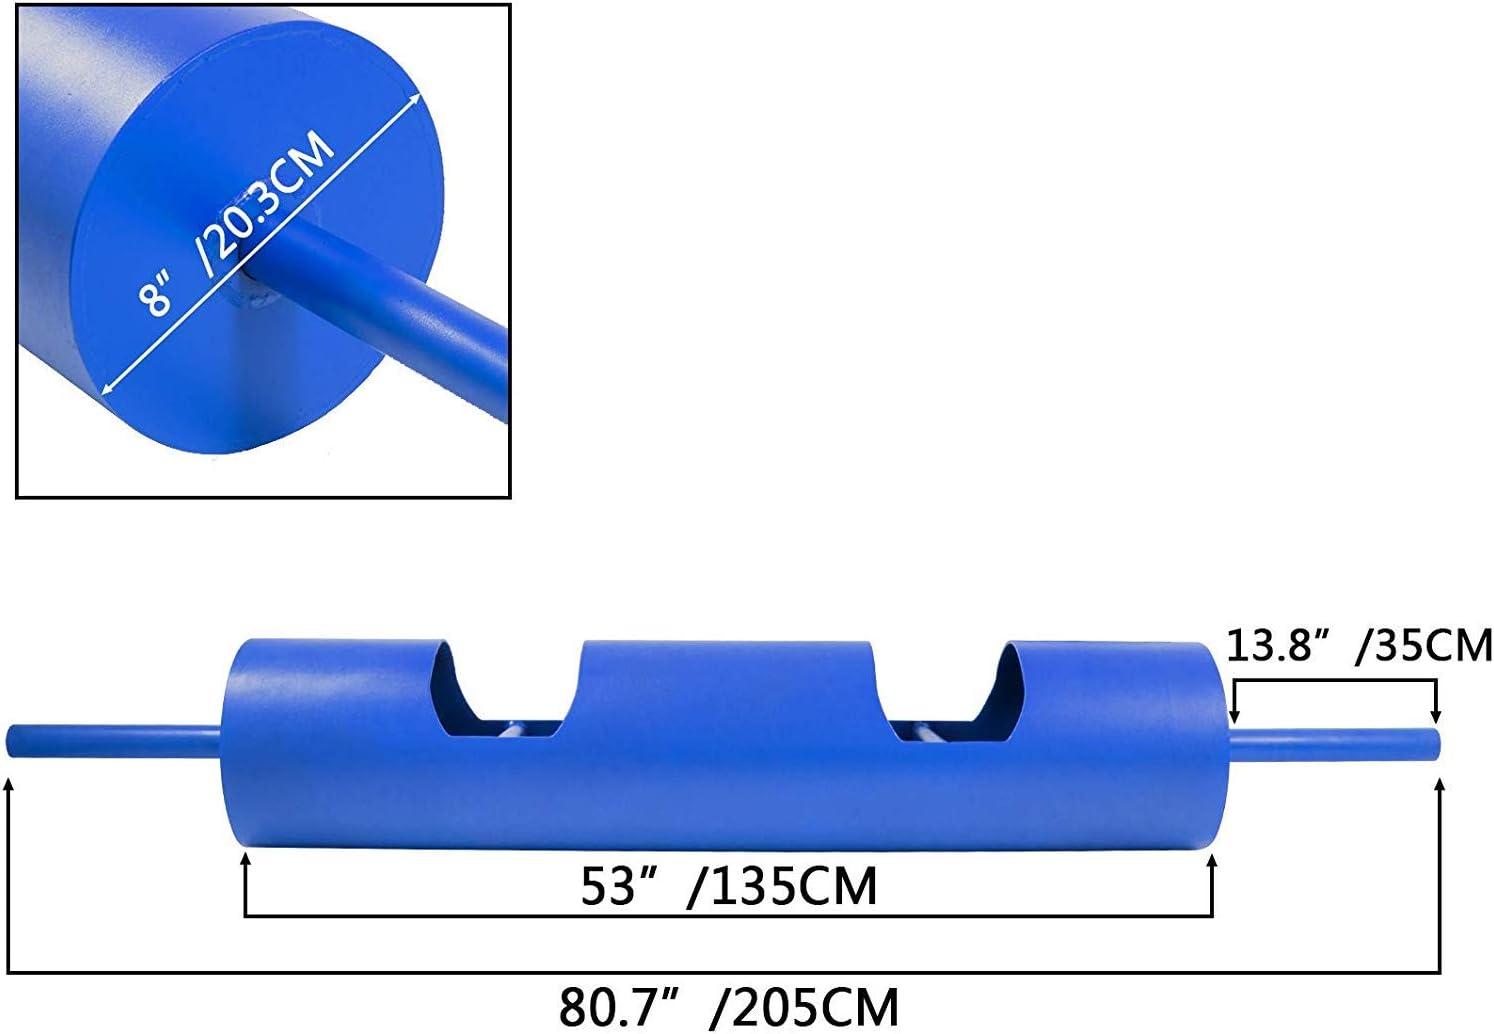 BuoQua 8inch Strongman Log Bar Dia 1.2inch Powerlifting Log Press Bar Weight Lifting Heavy Duty Strength Training Blue